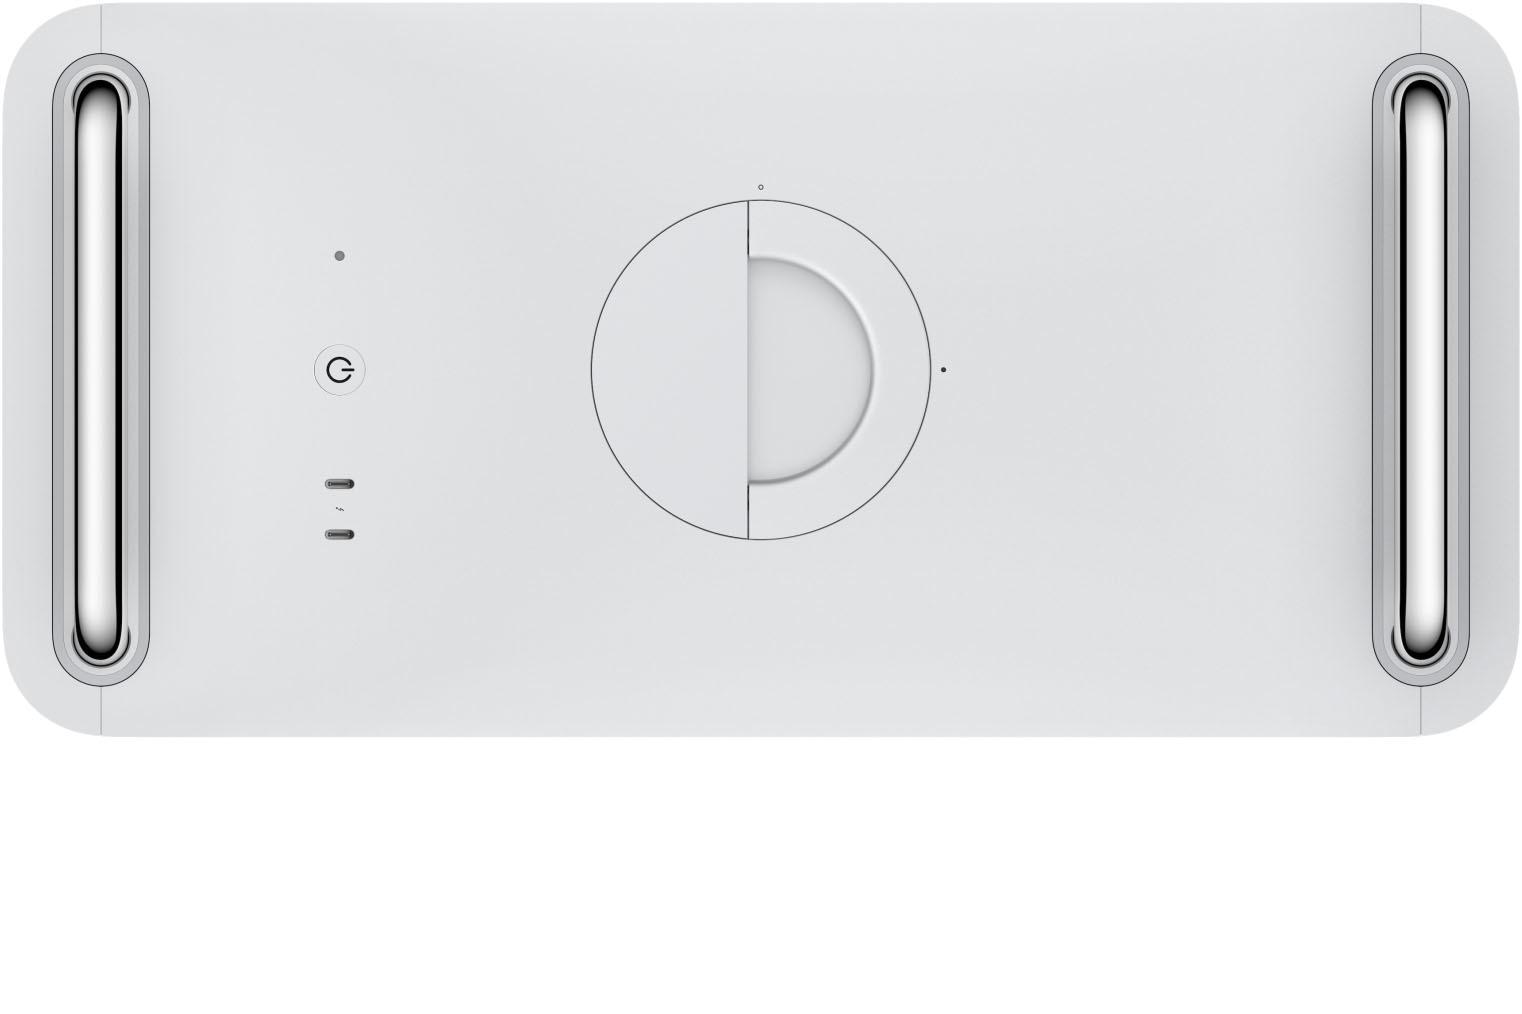 Apple's new Mac Pro